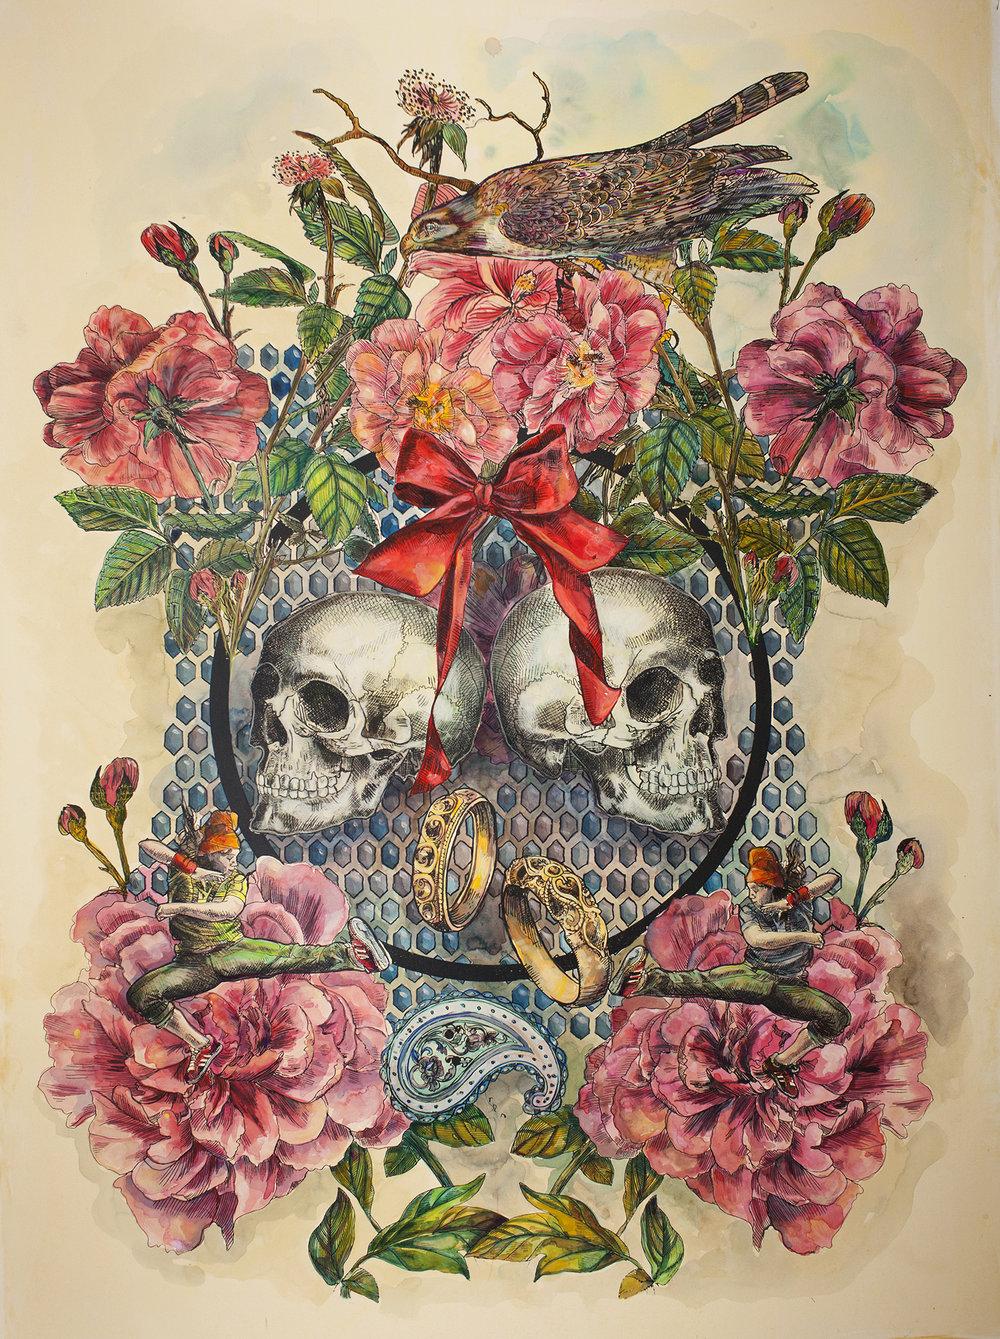 Cynthia Dinan-Mitchell, Botanical Bend, sérigraphie, 2016.